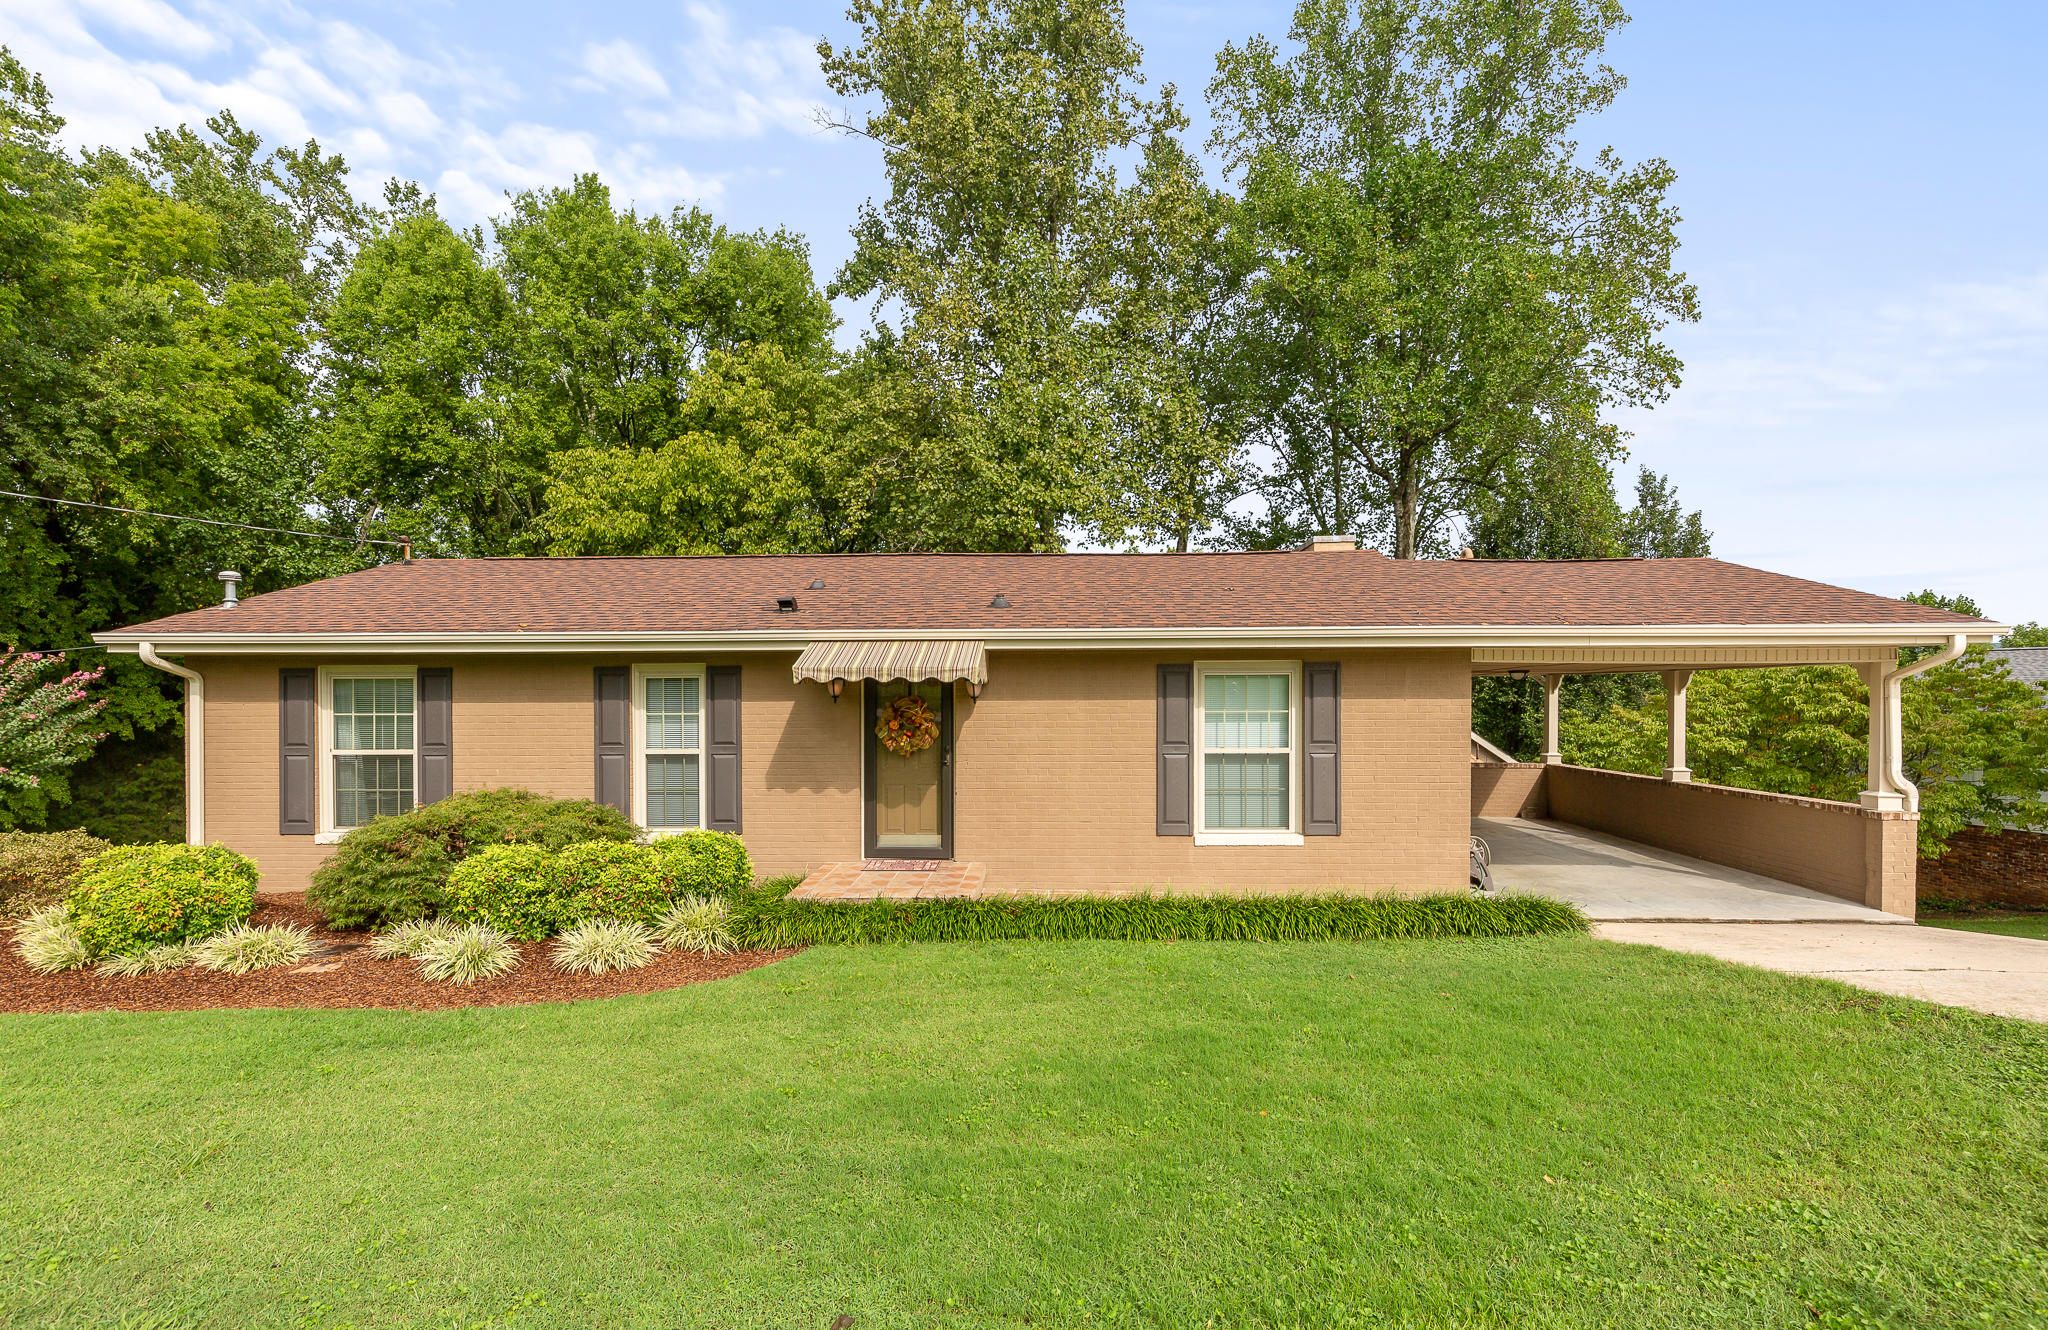 657 Evergreen Dr, Dayton, TN 37321